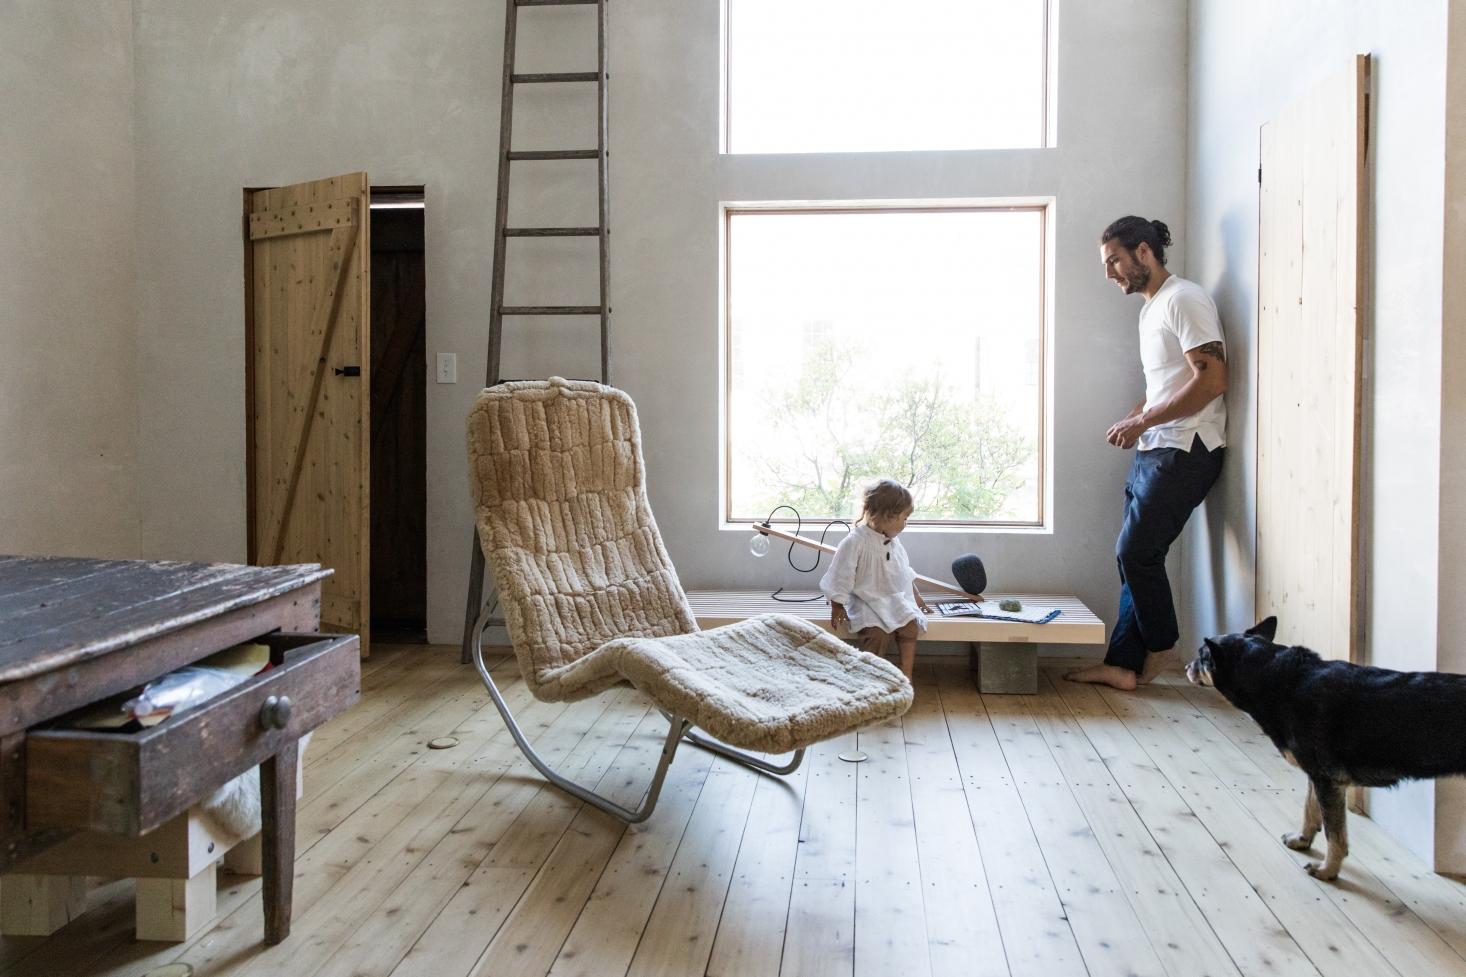 anthony-esteves-soot-house-living-room-4-maine-greta-rybus-1466x977.jpg